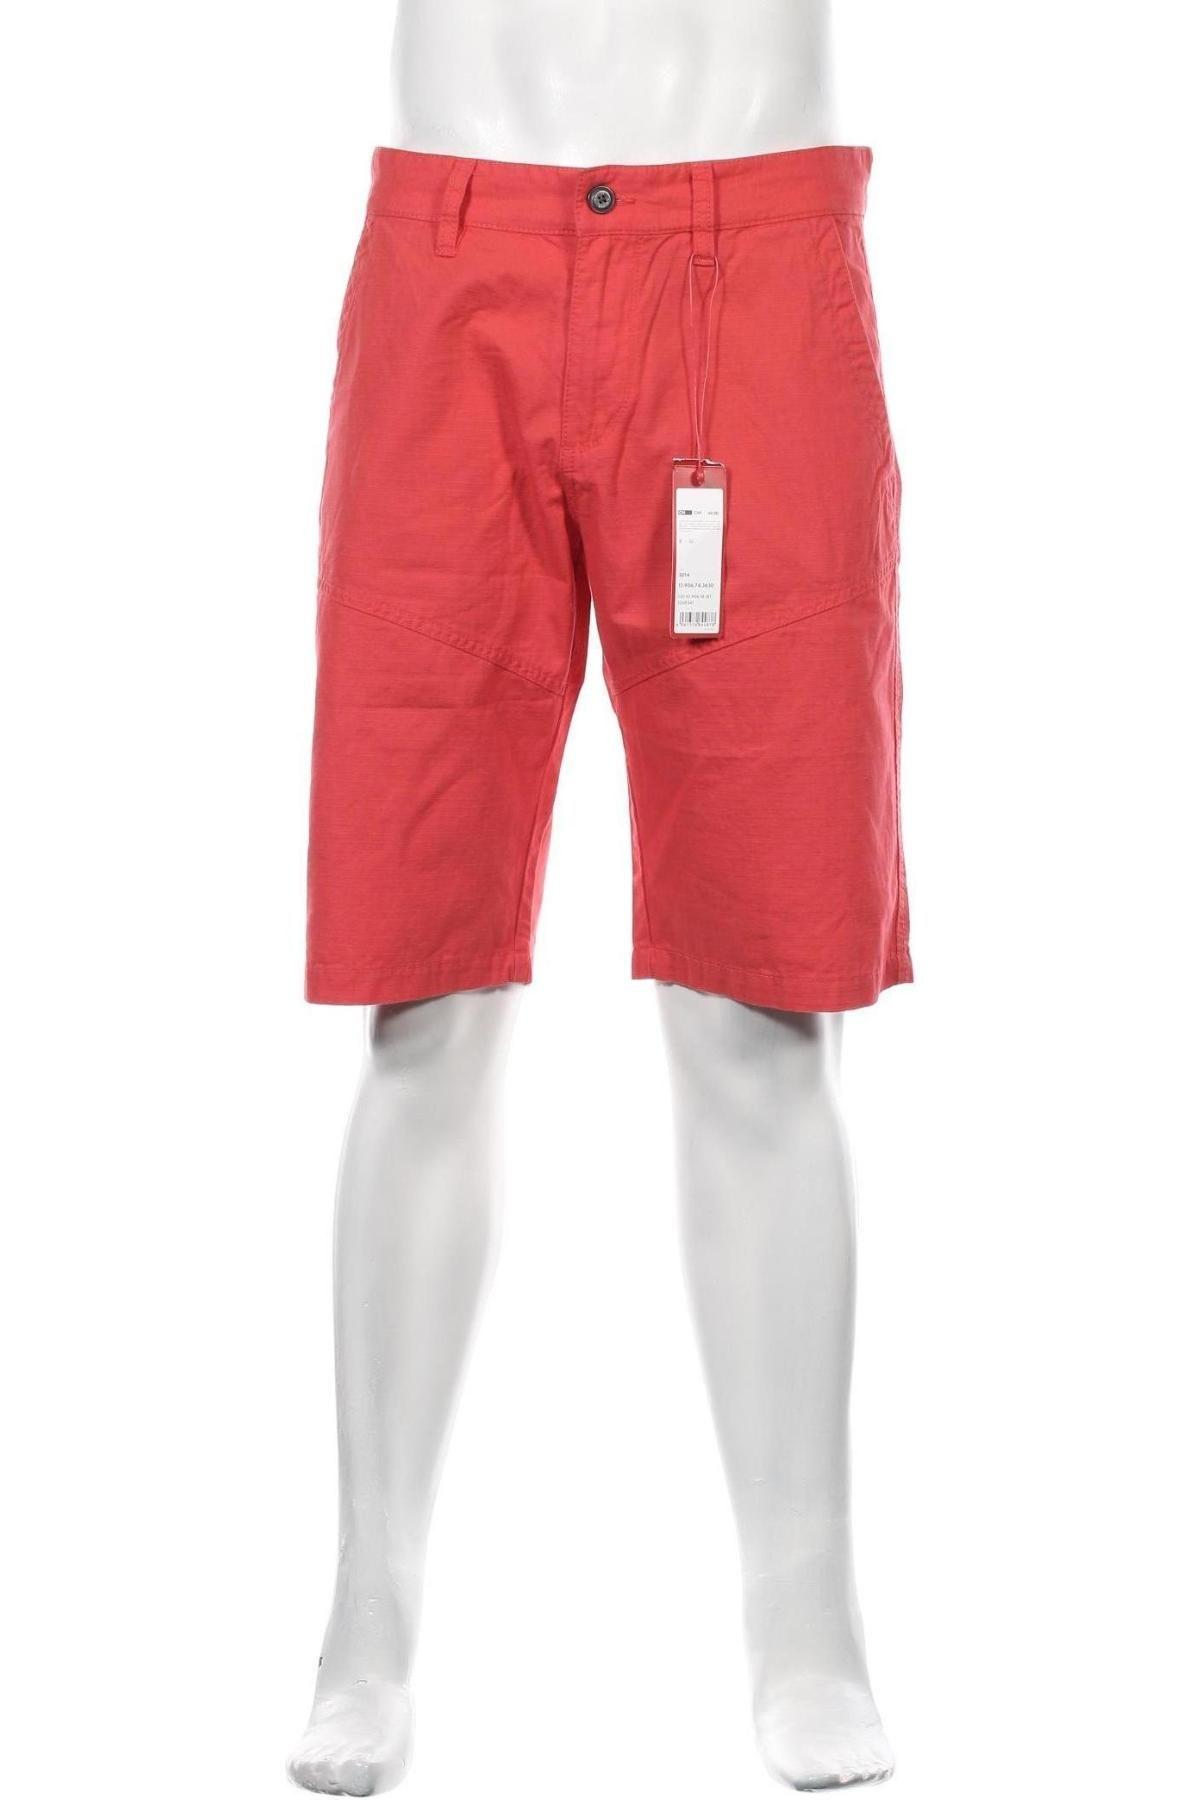 Pánské kraťasy S.Oliver, Velikost M, Barva Červená, Bavlna, Cena  254,00Kč